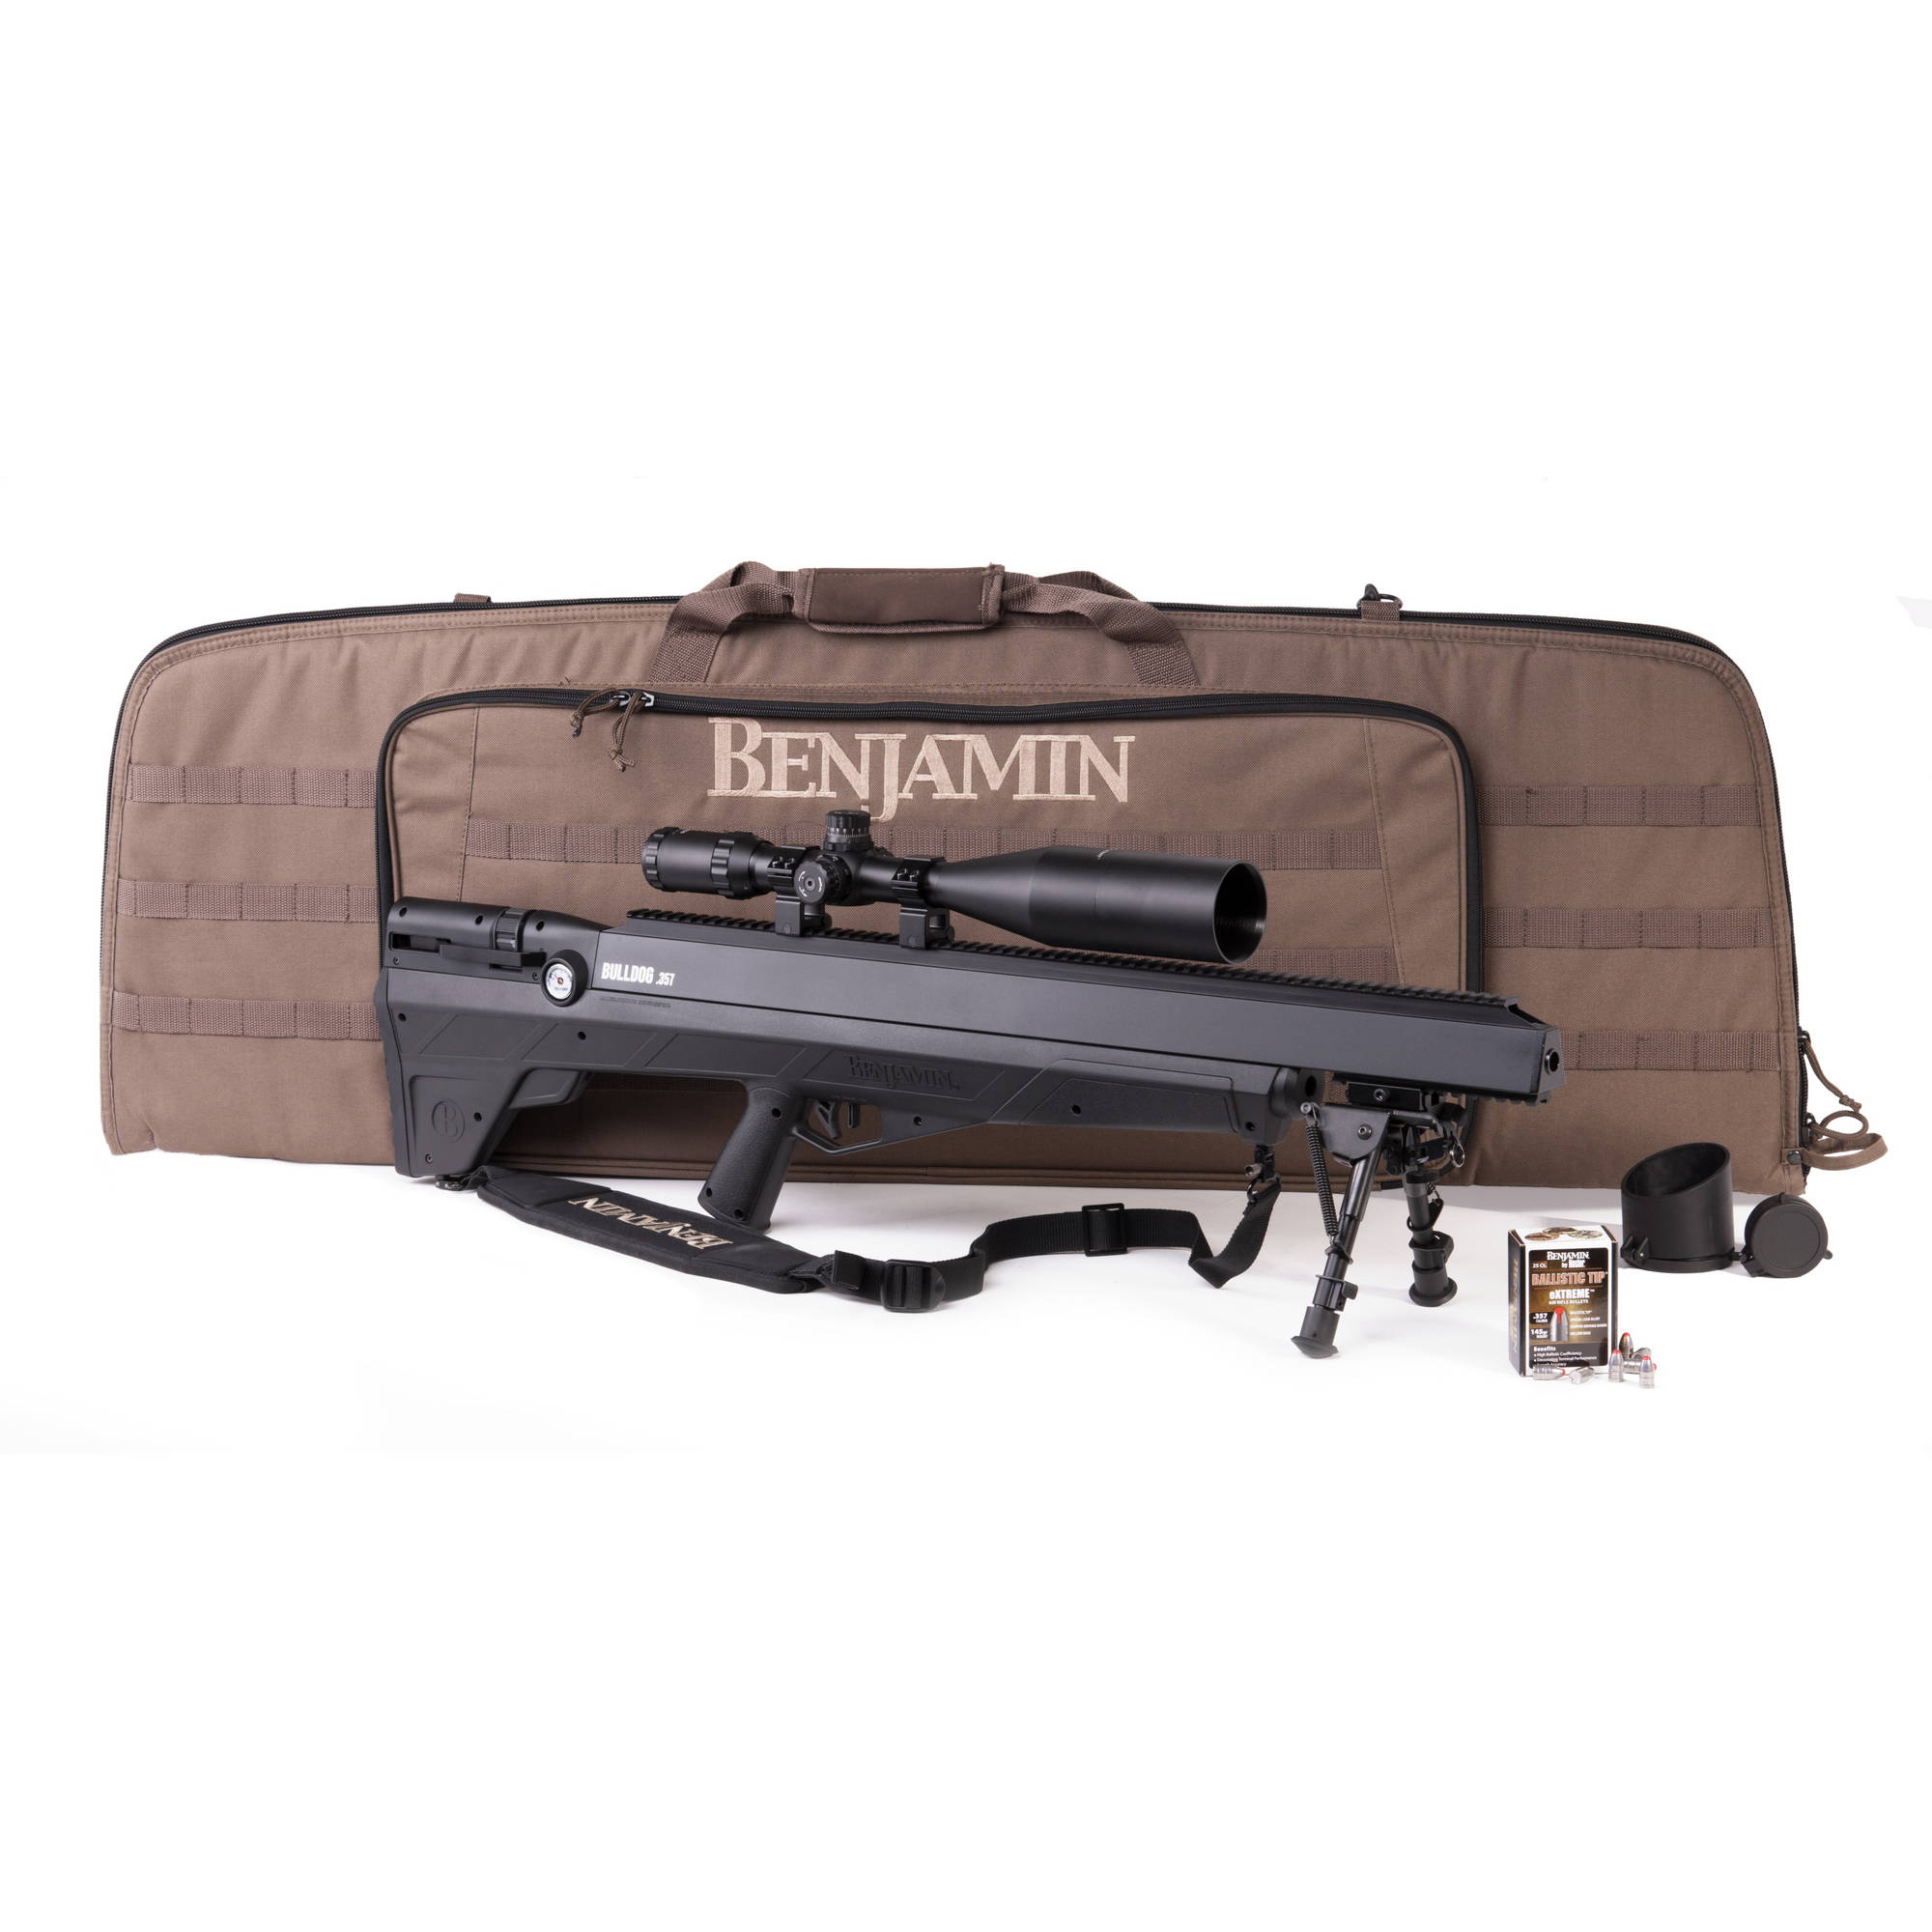 Benjamin Bulldog .357 Caliber PCP Air Rifle, Sportsman's Package by